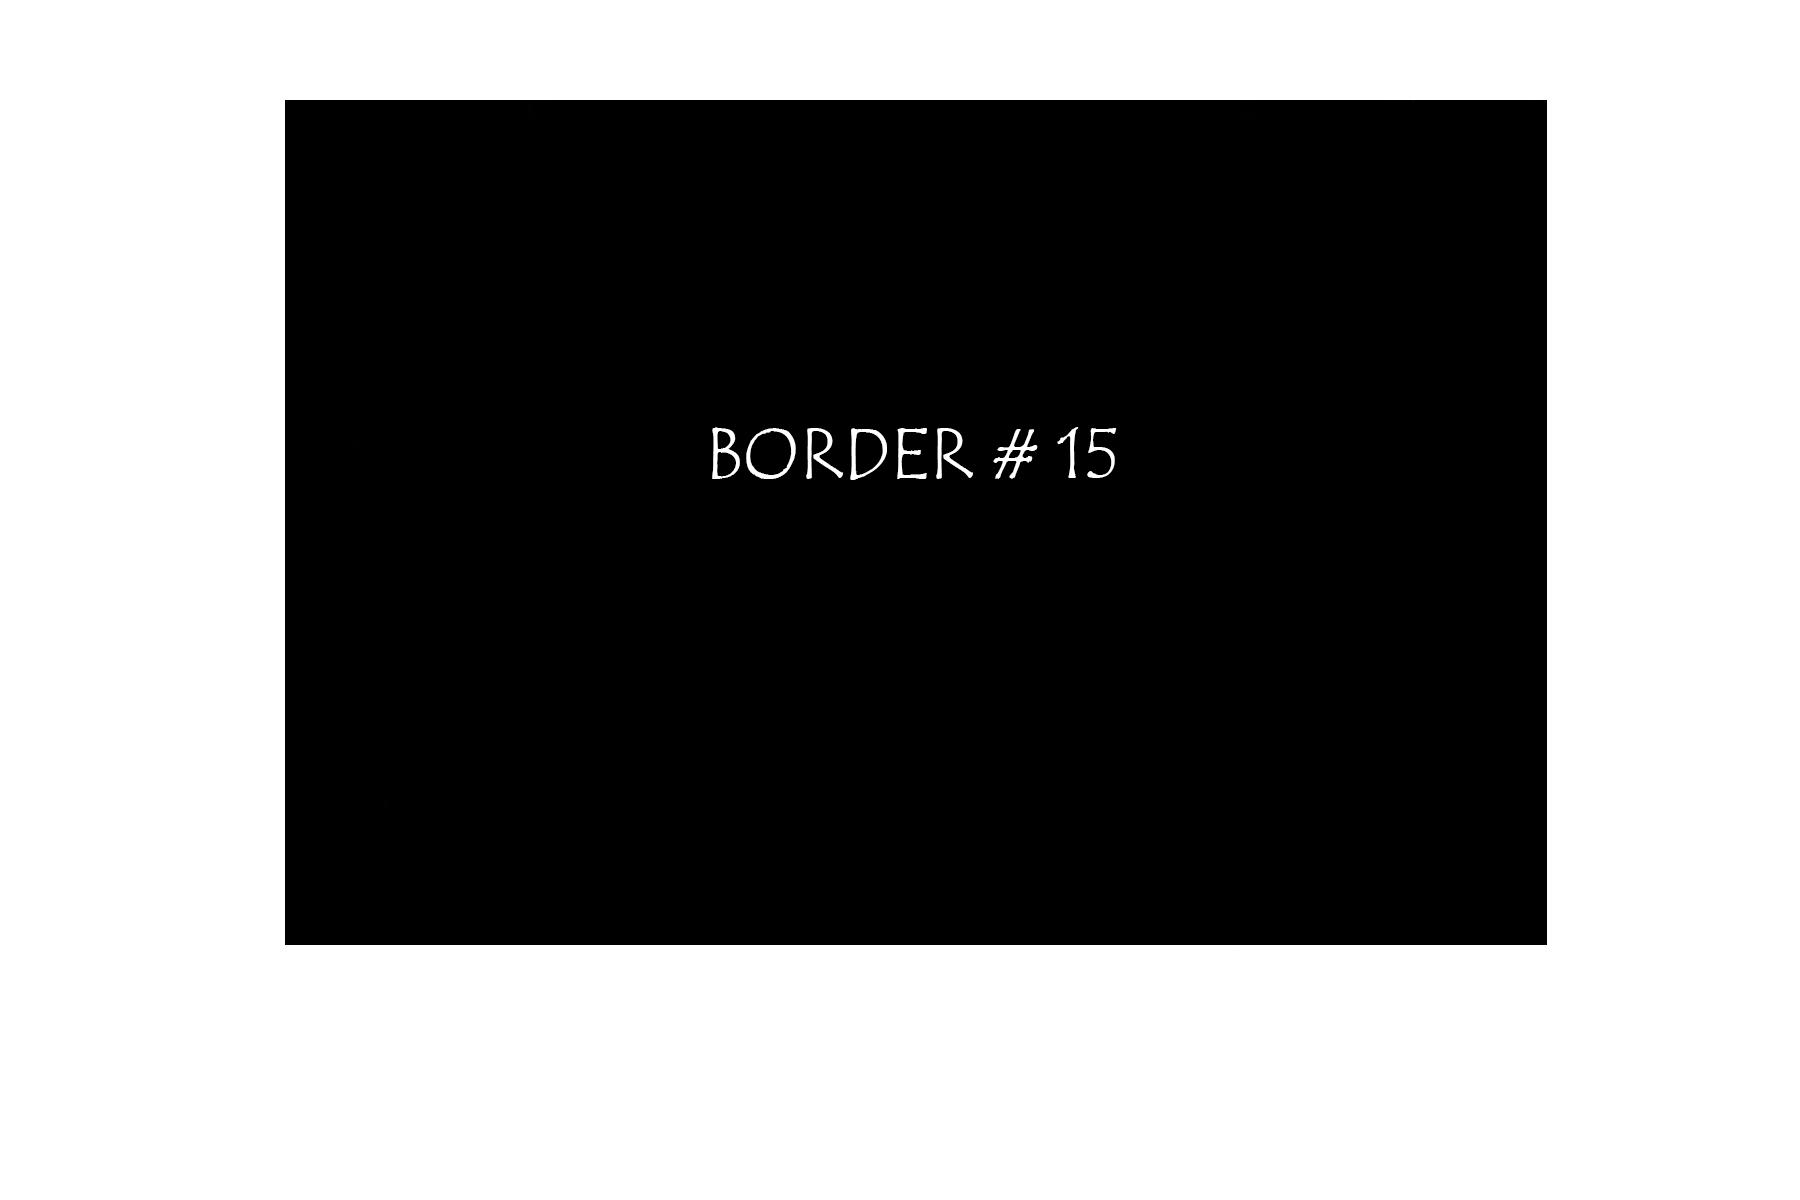 BORDER#15